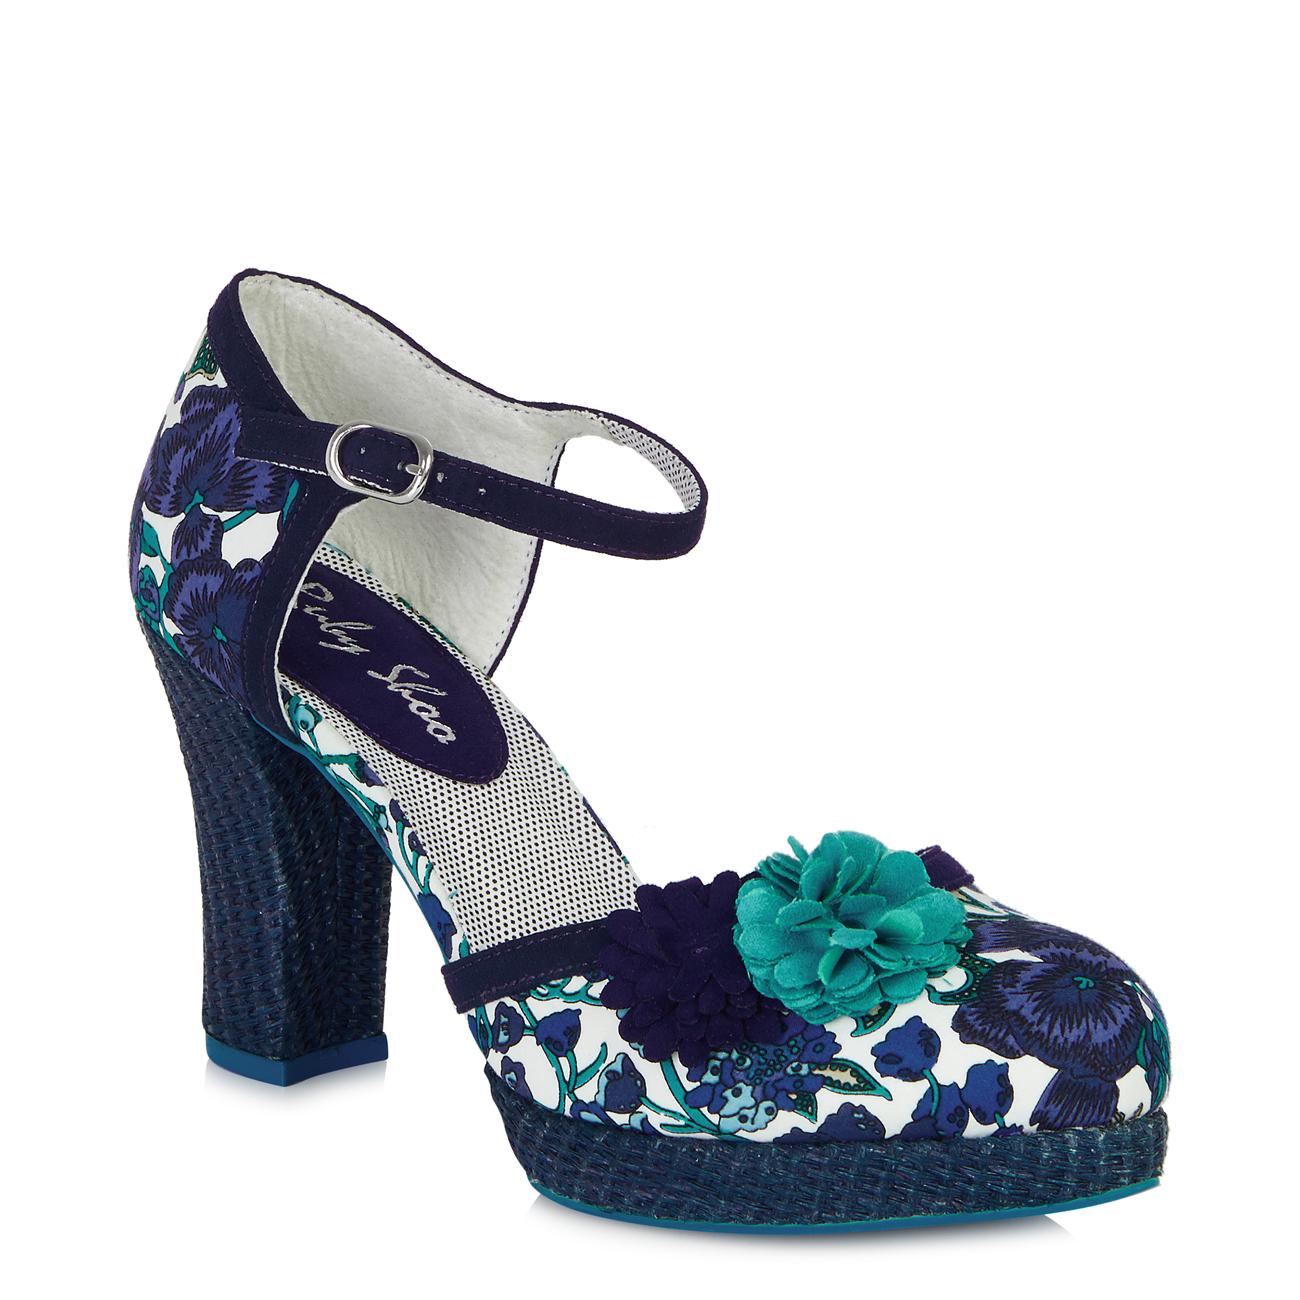 NEW Ruby Shoo Floral Raffia Heel Flo Shoes 3-8 36-41 Summer 1970s Mango Blue